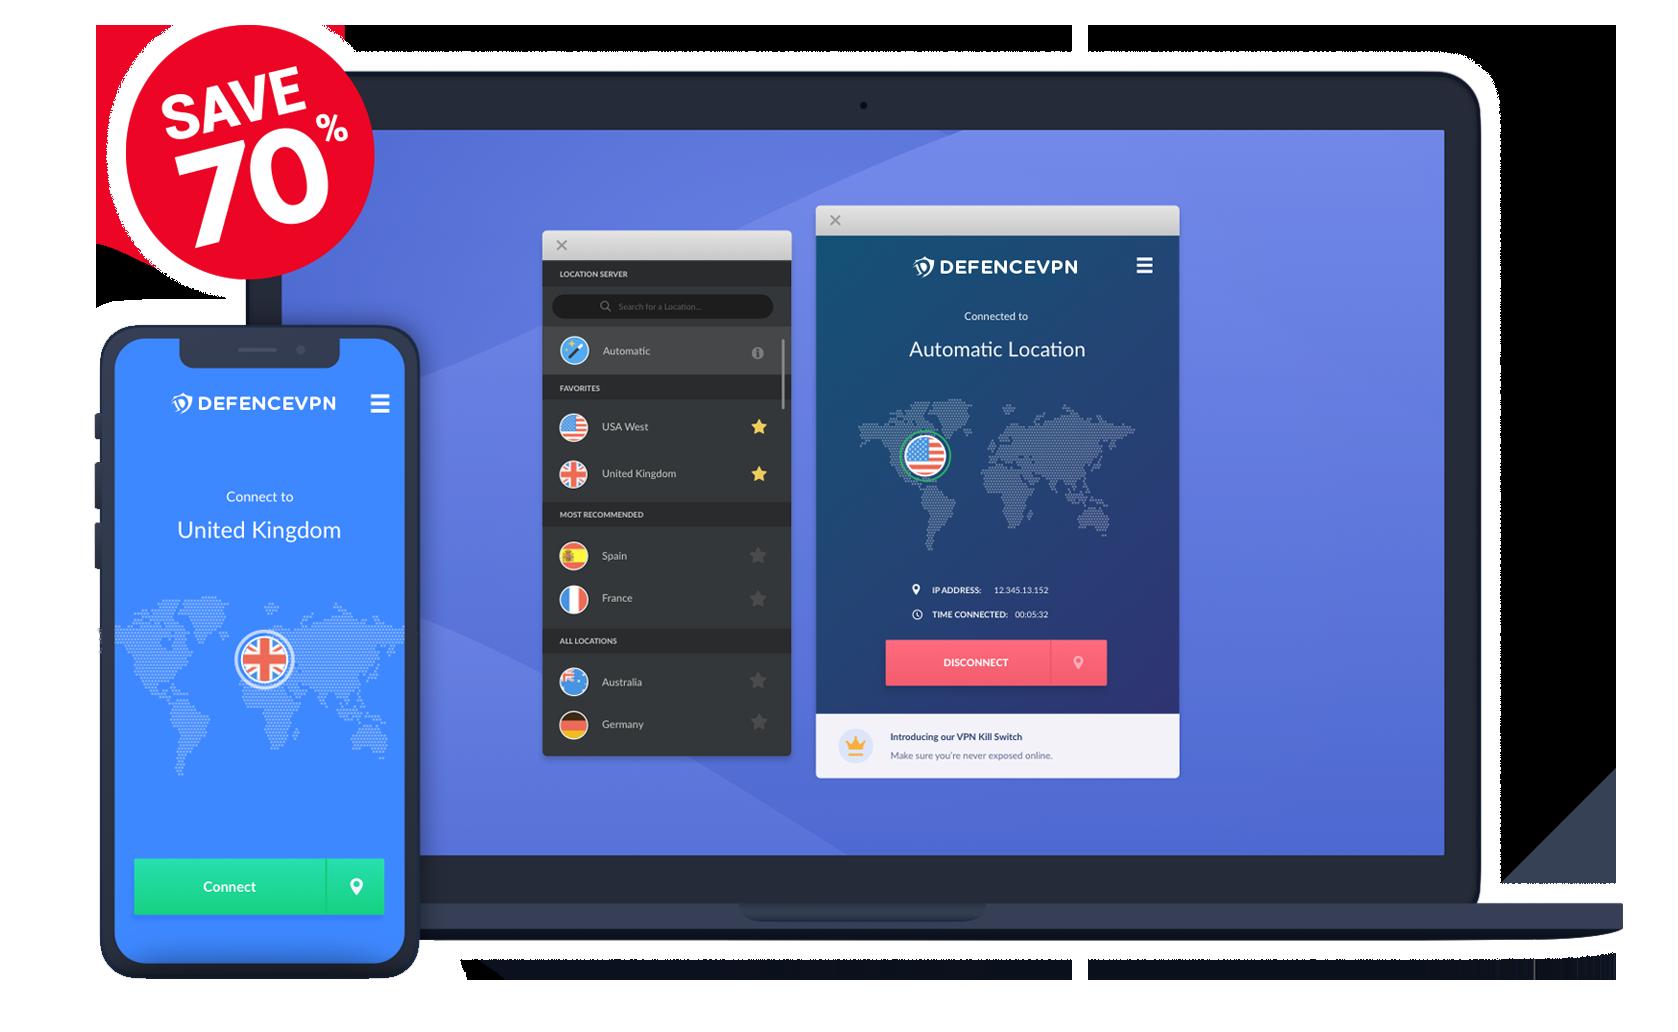 Get Your FREE VPN Trial Now! | DefenceVPN